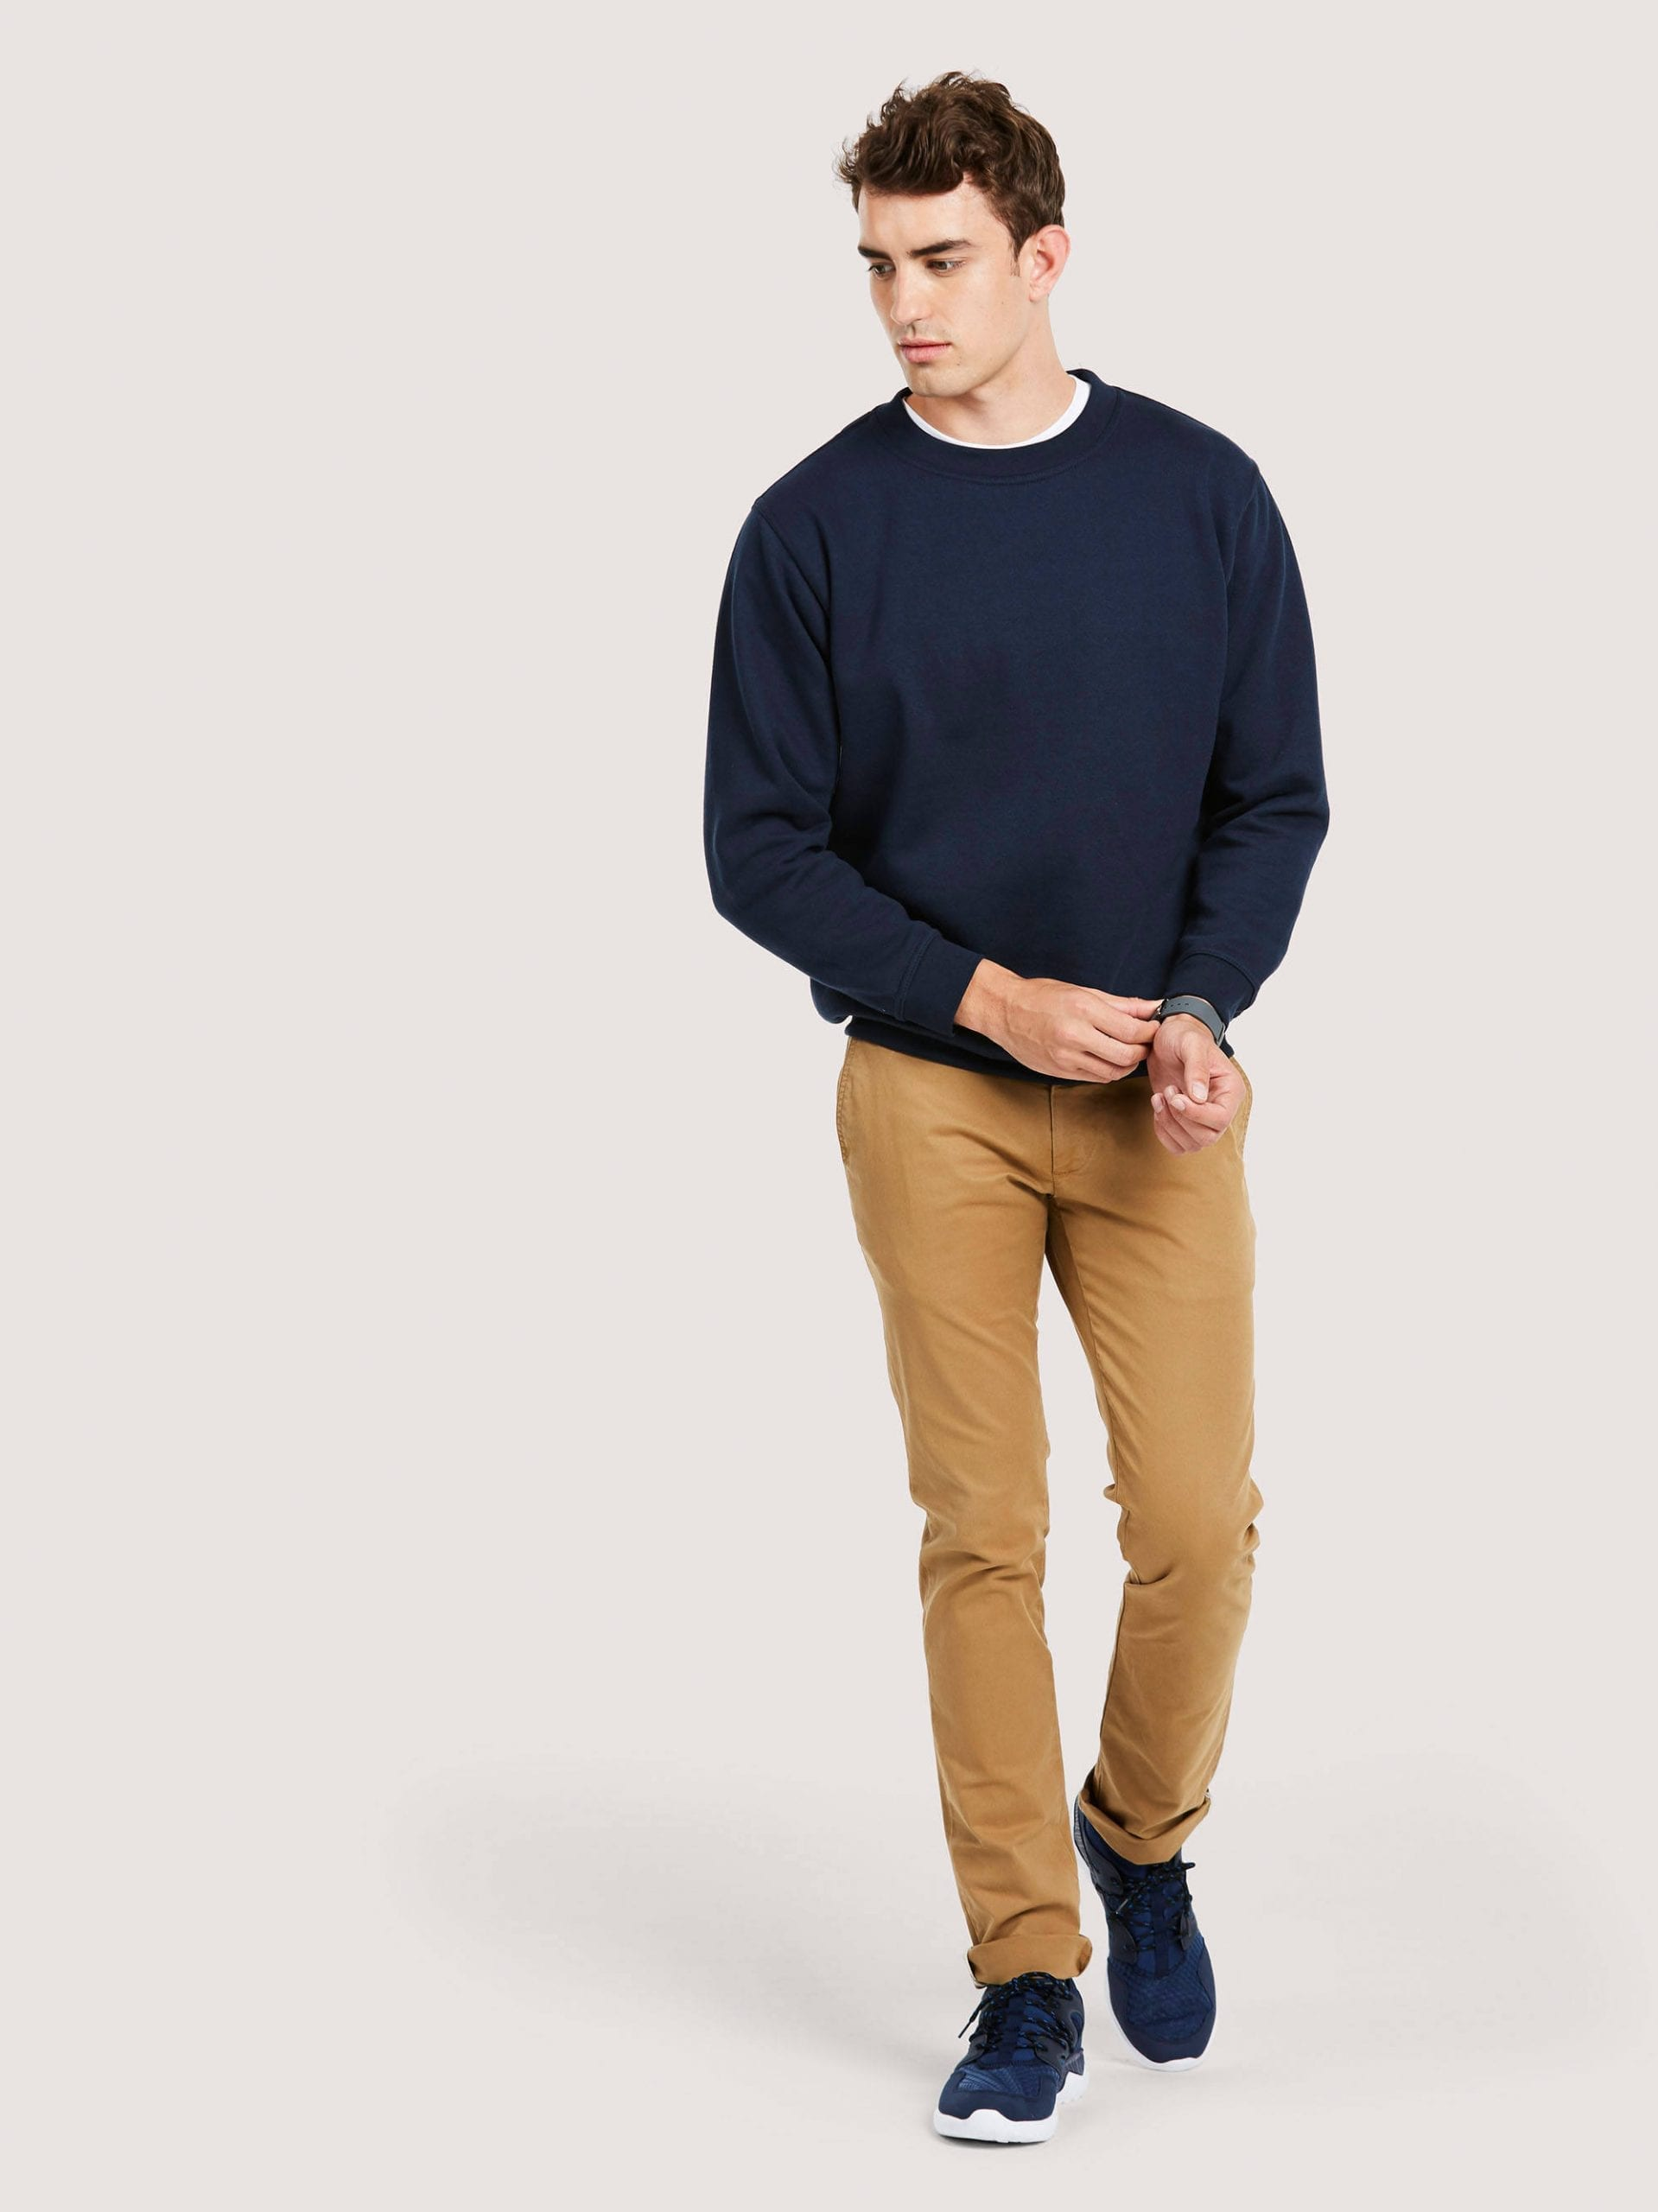 Uneek Adult Sweatshirt